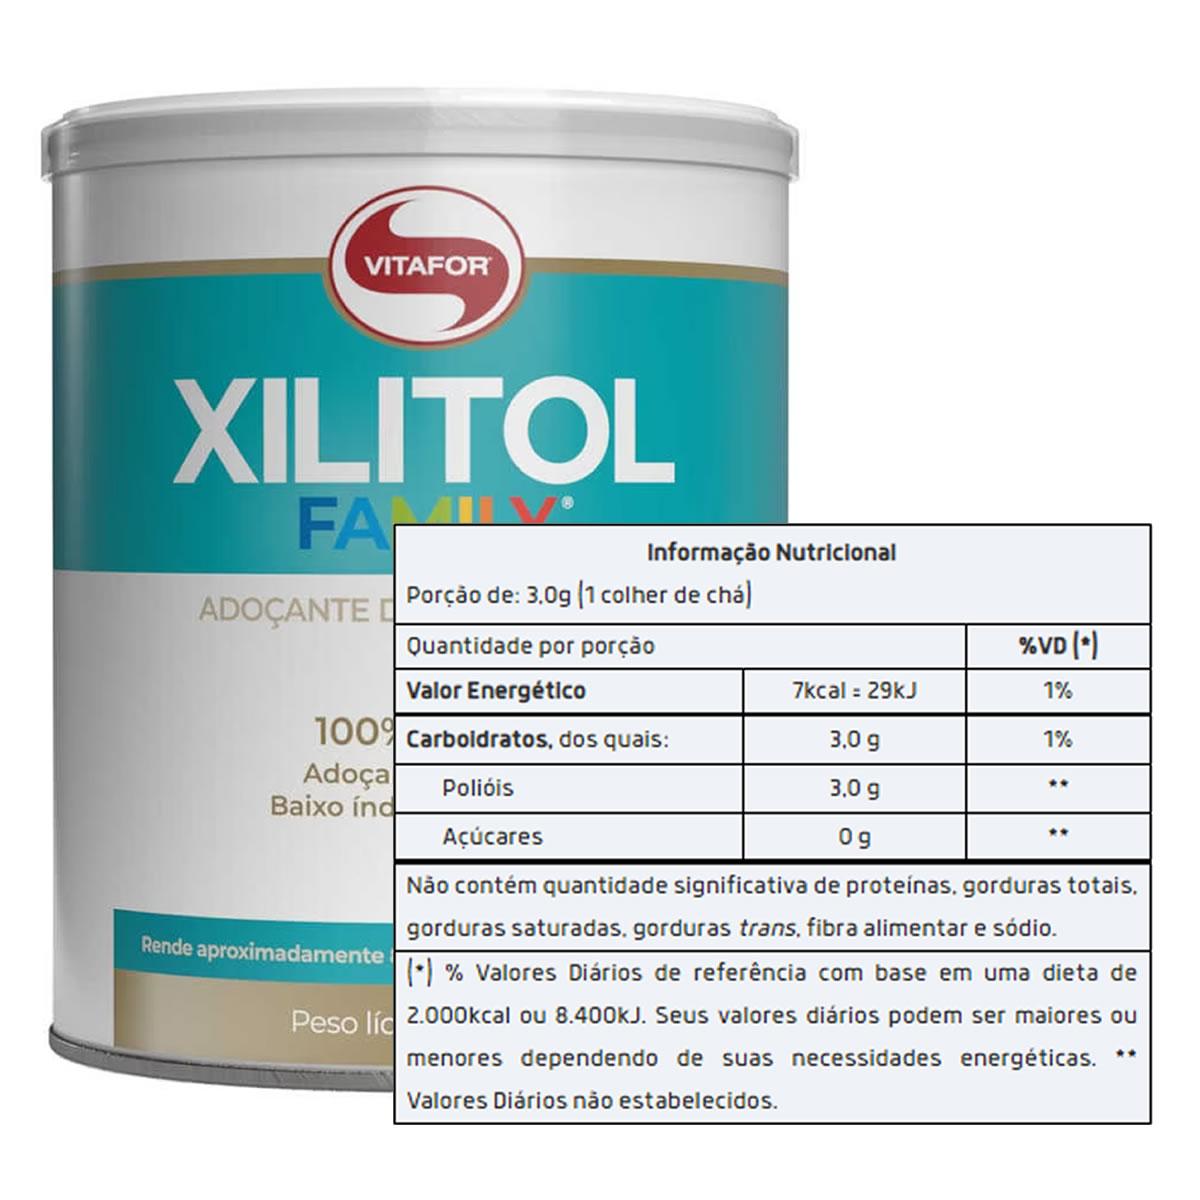 Xilitol Family 250g - Vitafor